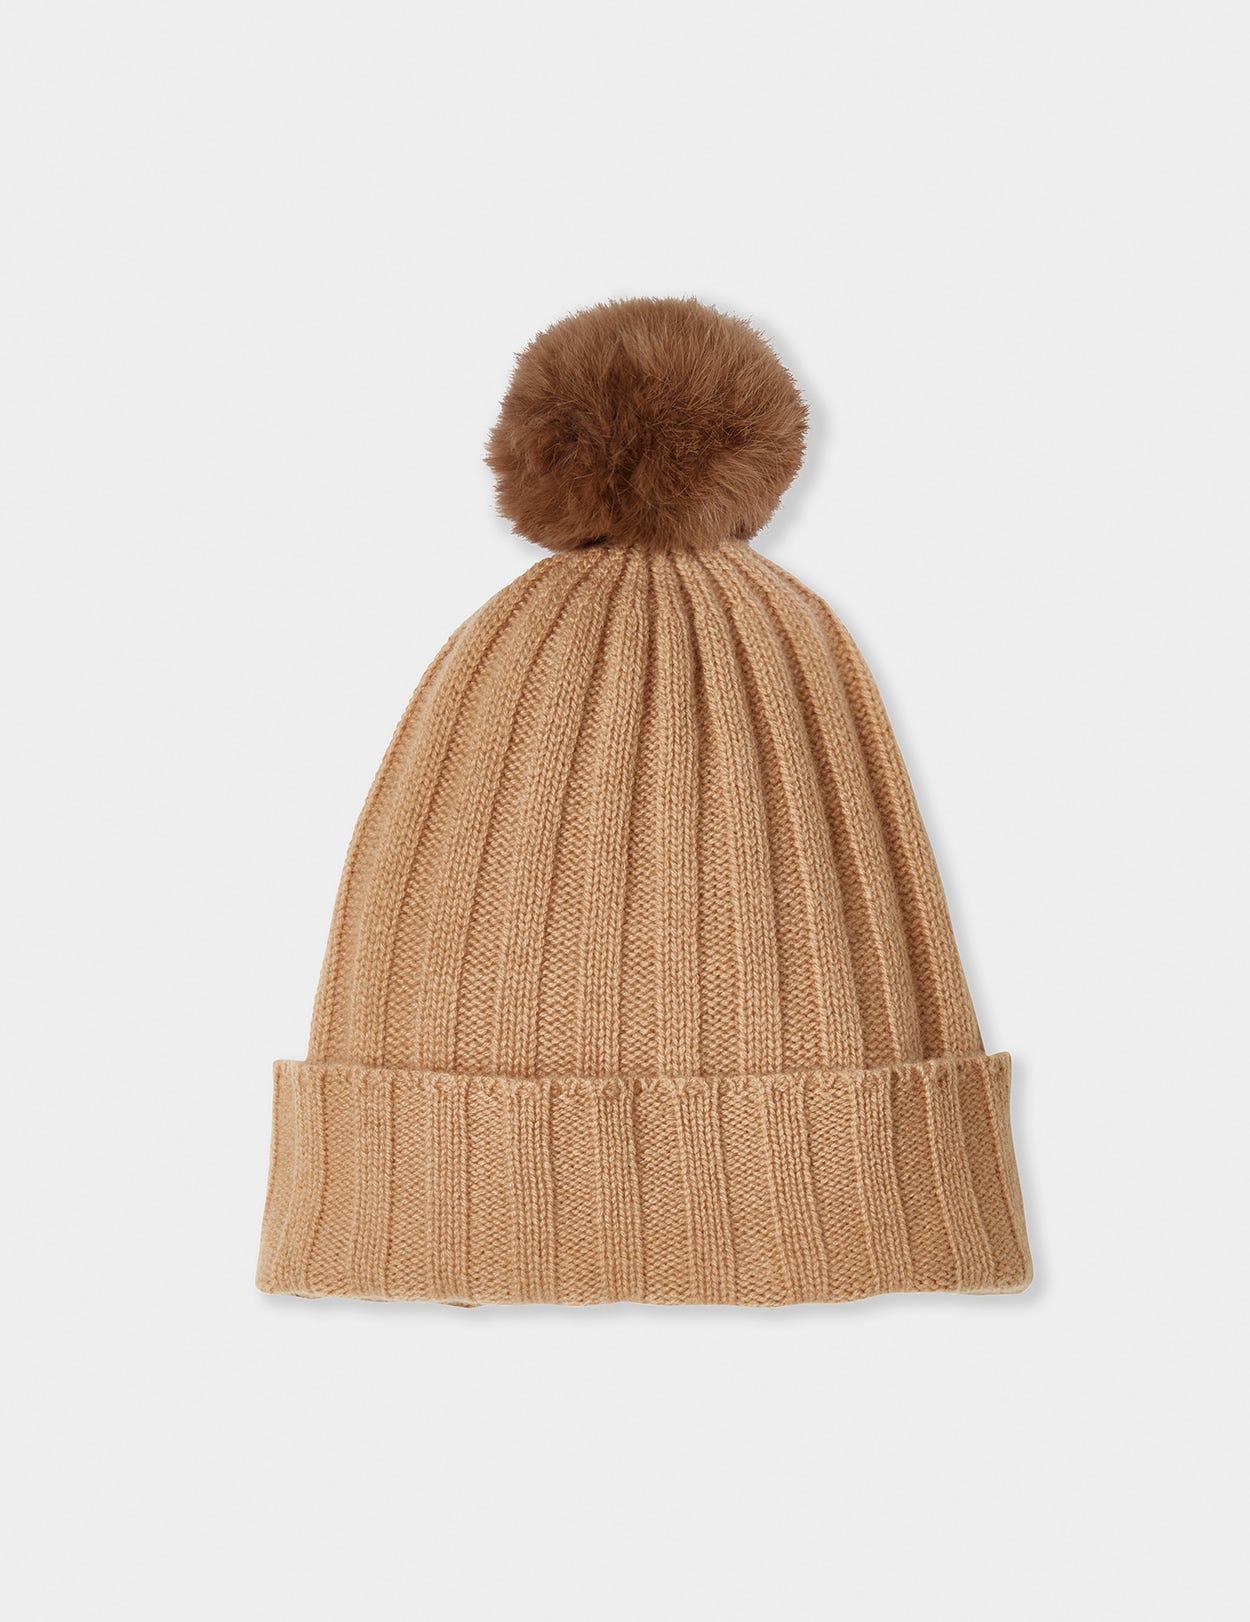 Cashmere Hat with detachable pom pom